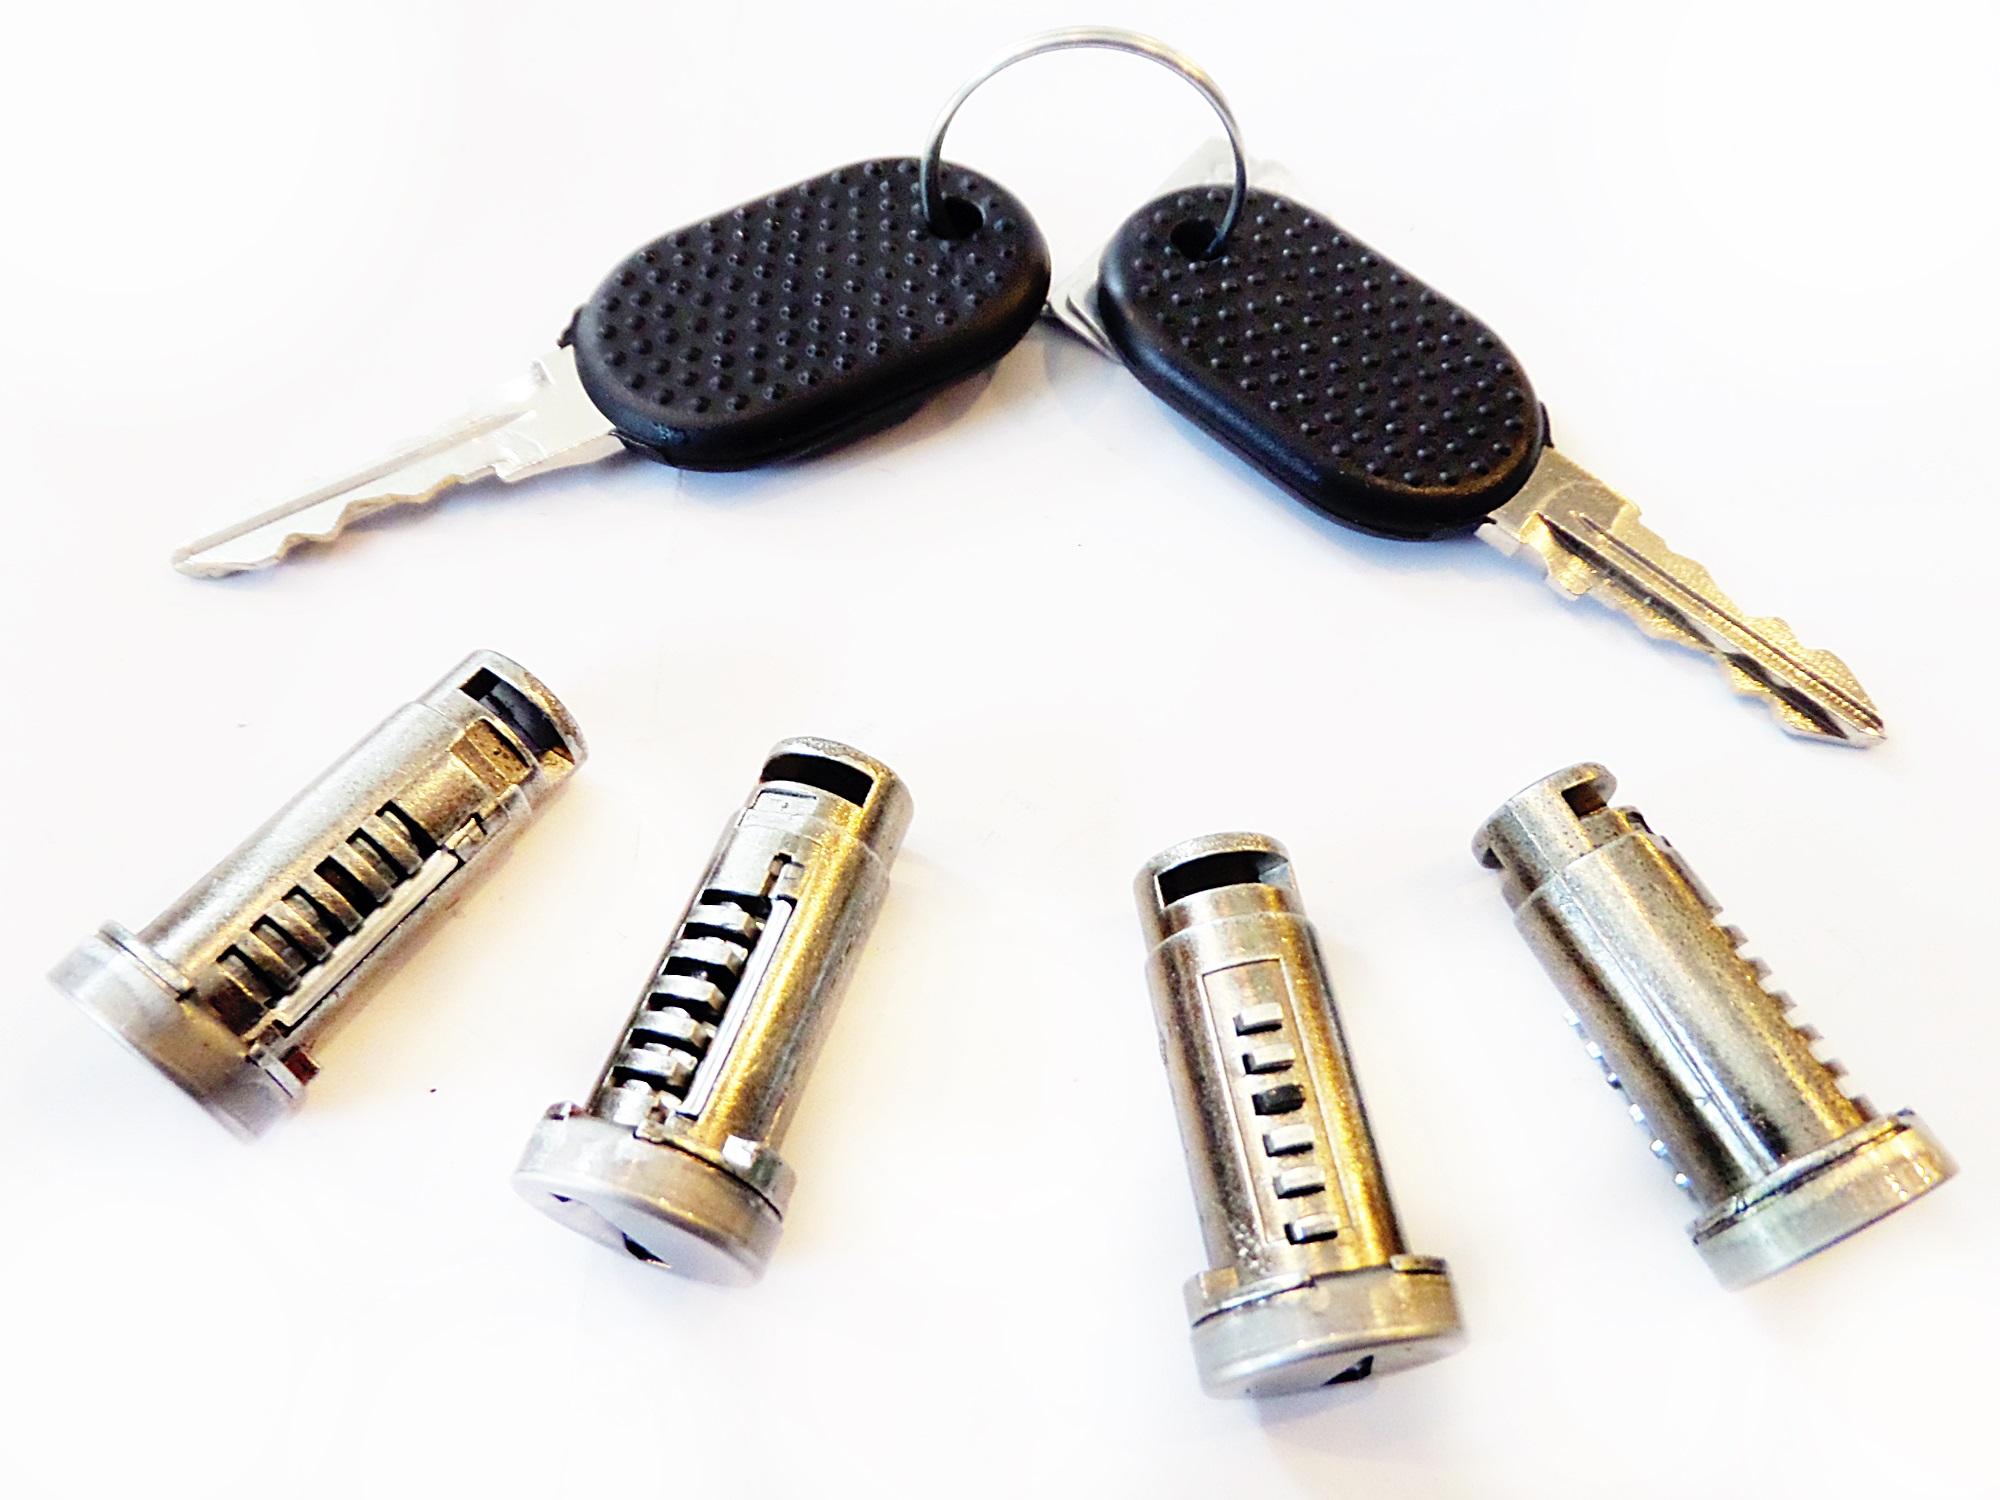 вставка барабан замка 4szt + ключи fiat 126p el